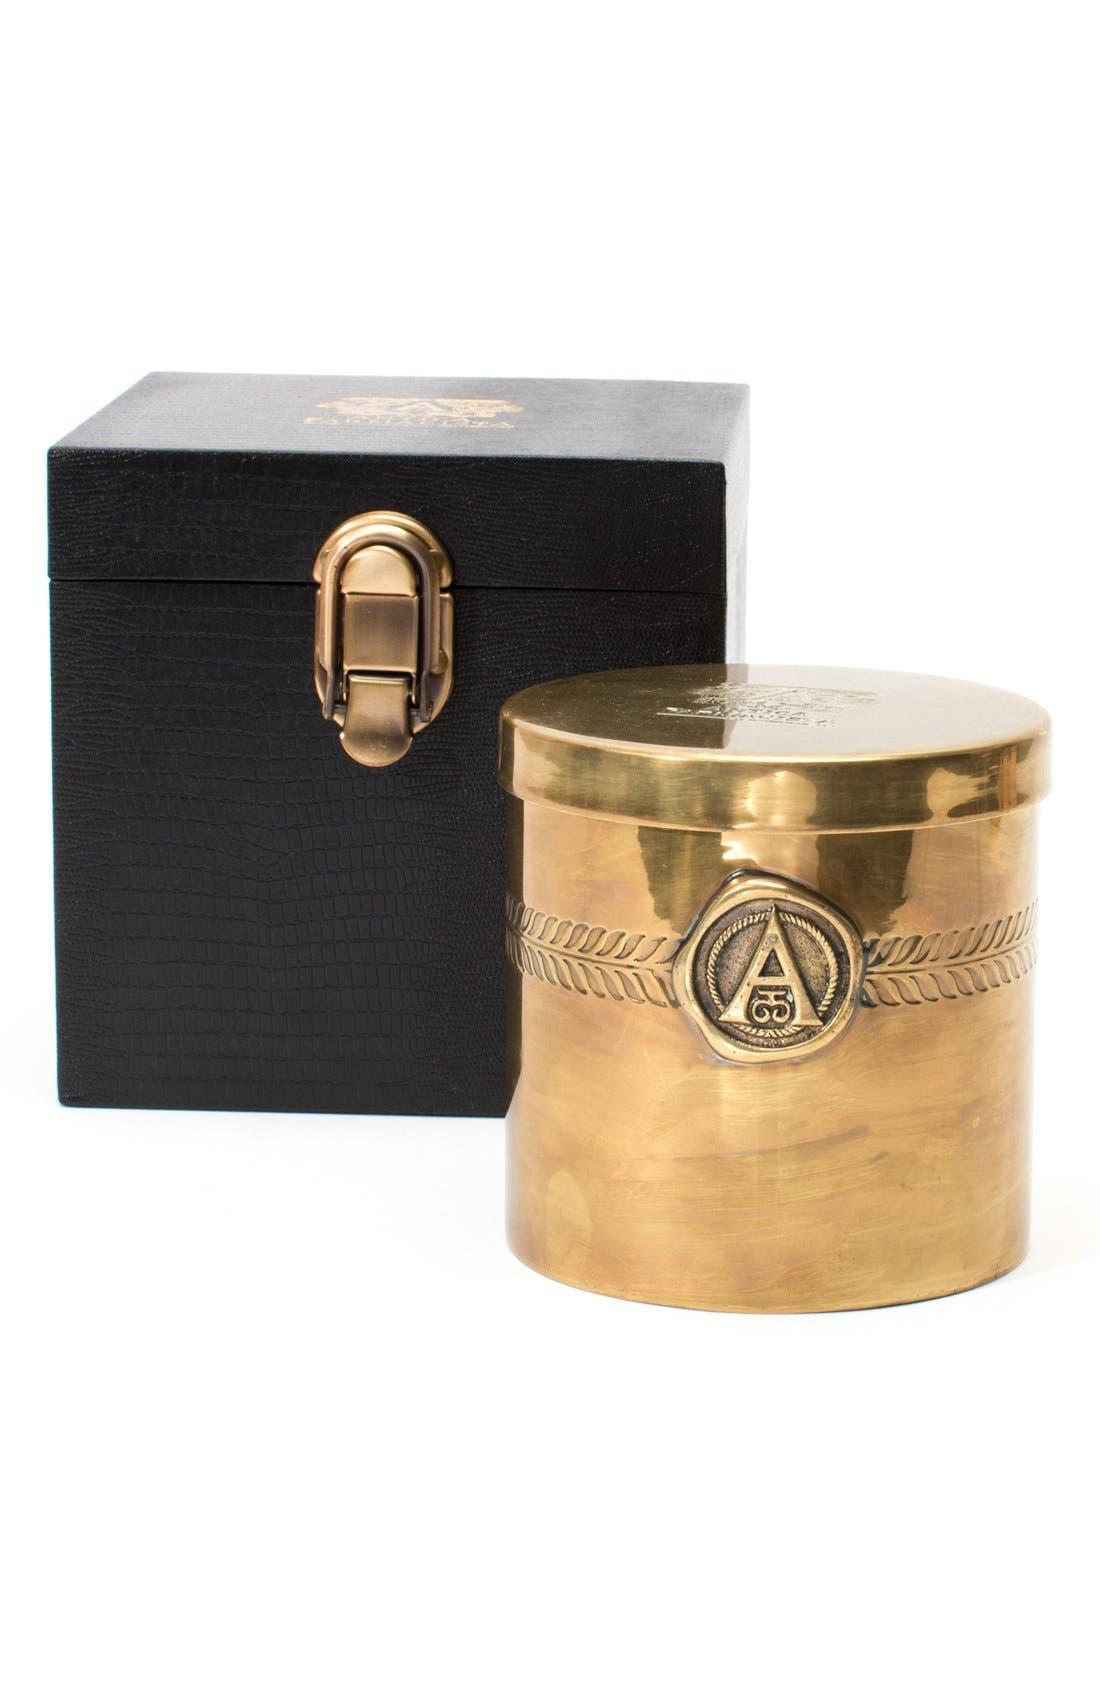 Antica Farmacista 'Champagne Black Label' Three-Wick Brass Candle (Limited Edition)